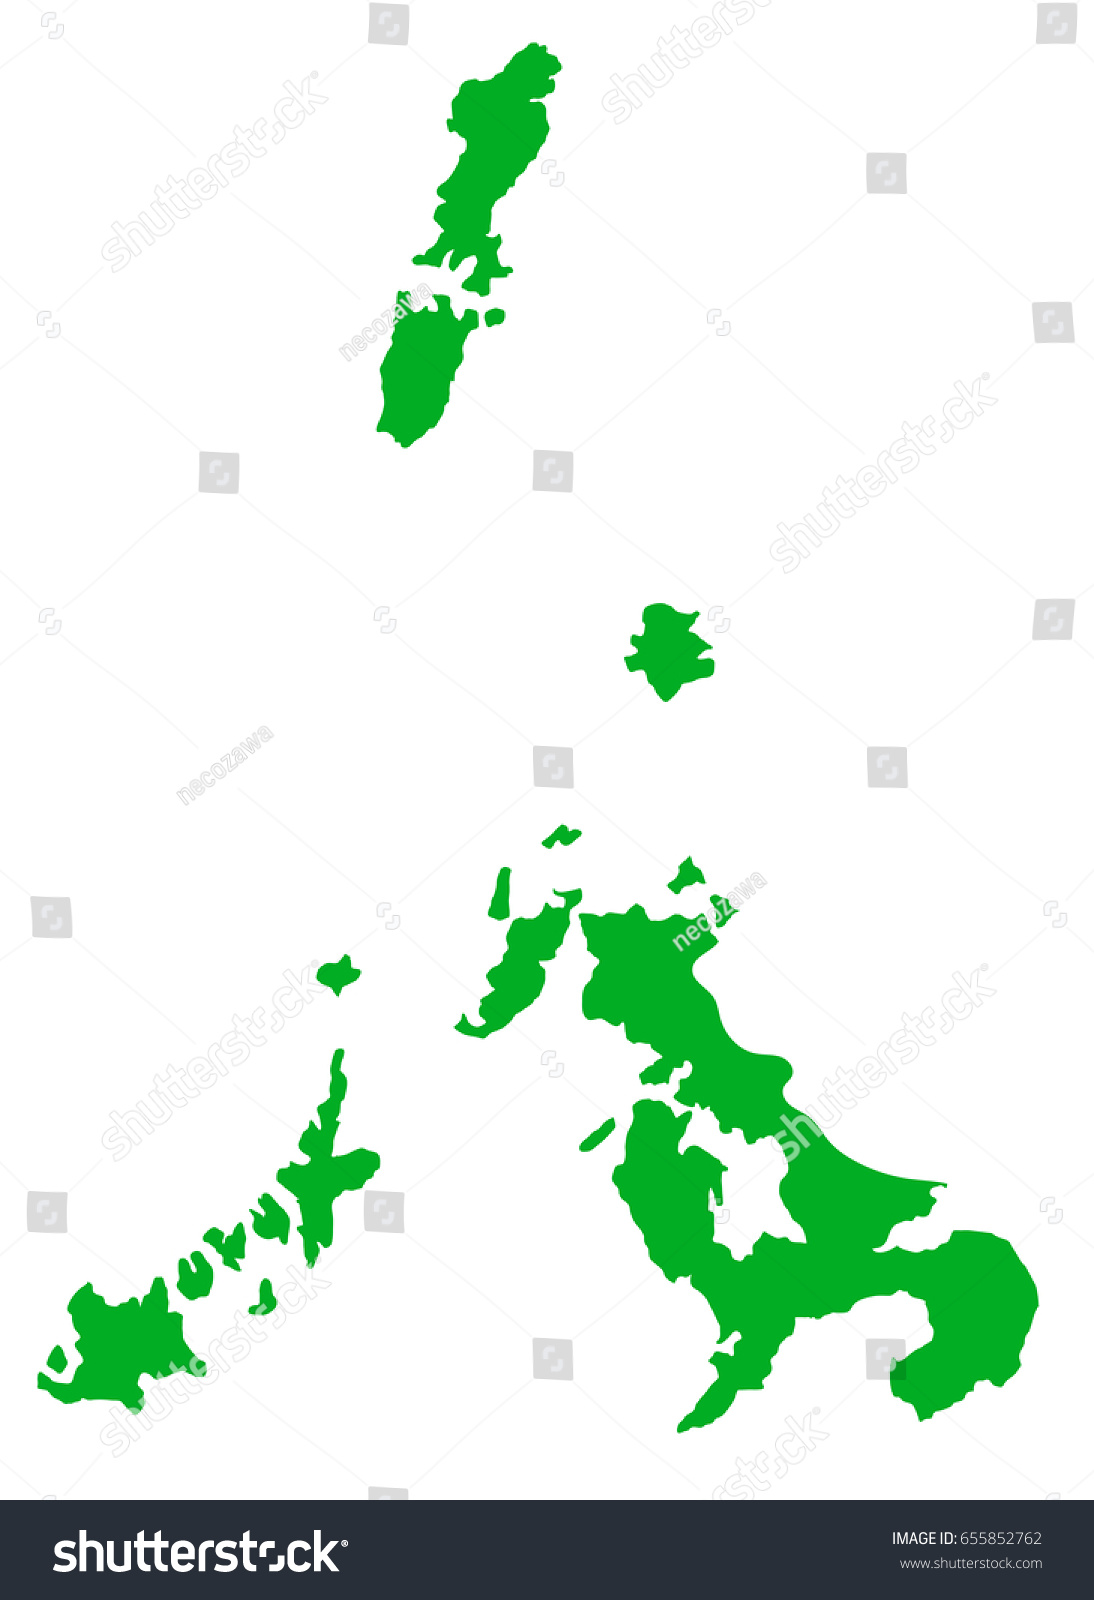 Japan Map Nagasaki Prefecture Stock Vector Shutterstock - Japan map by prefecture